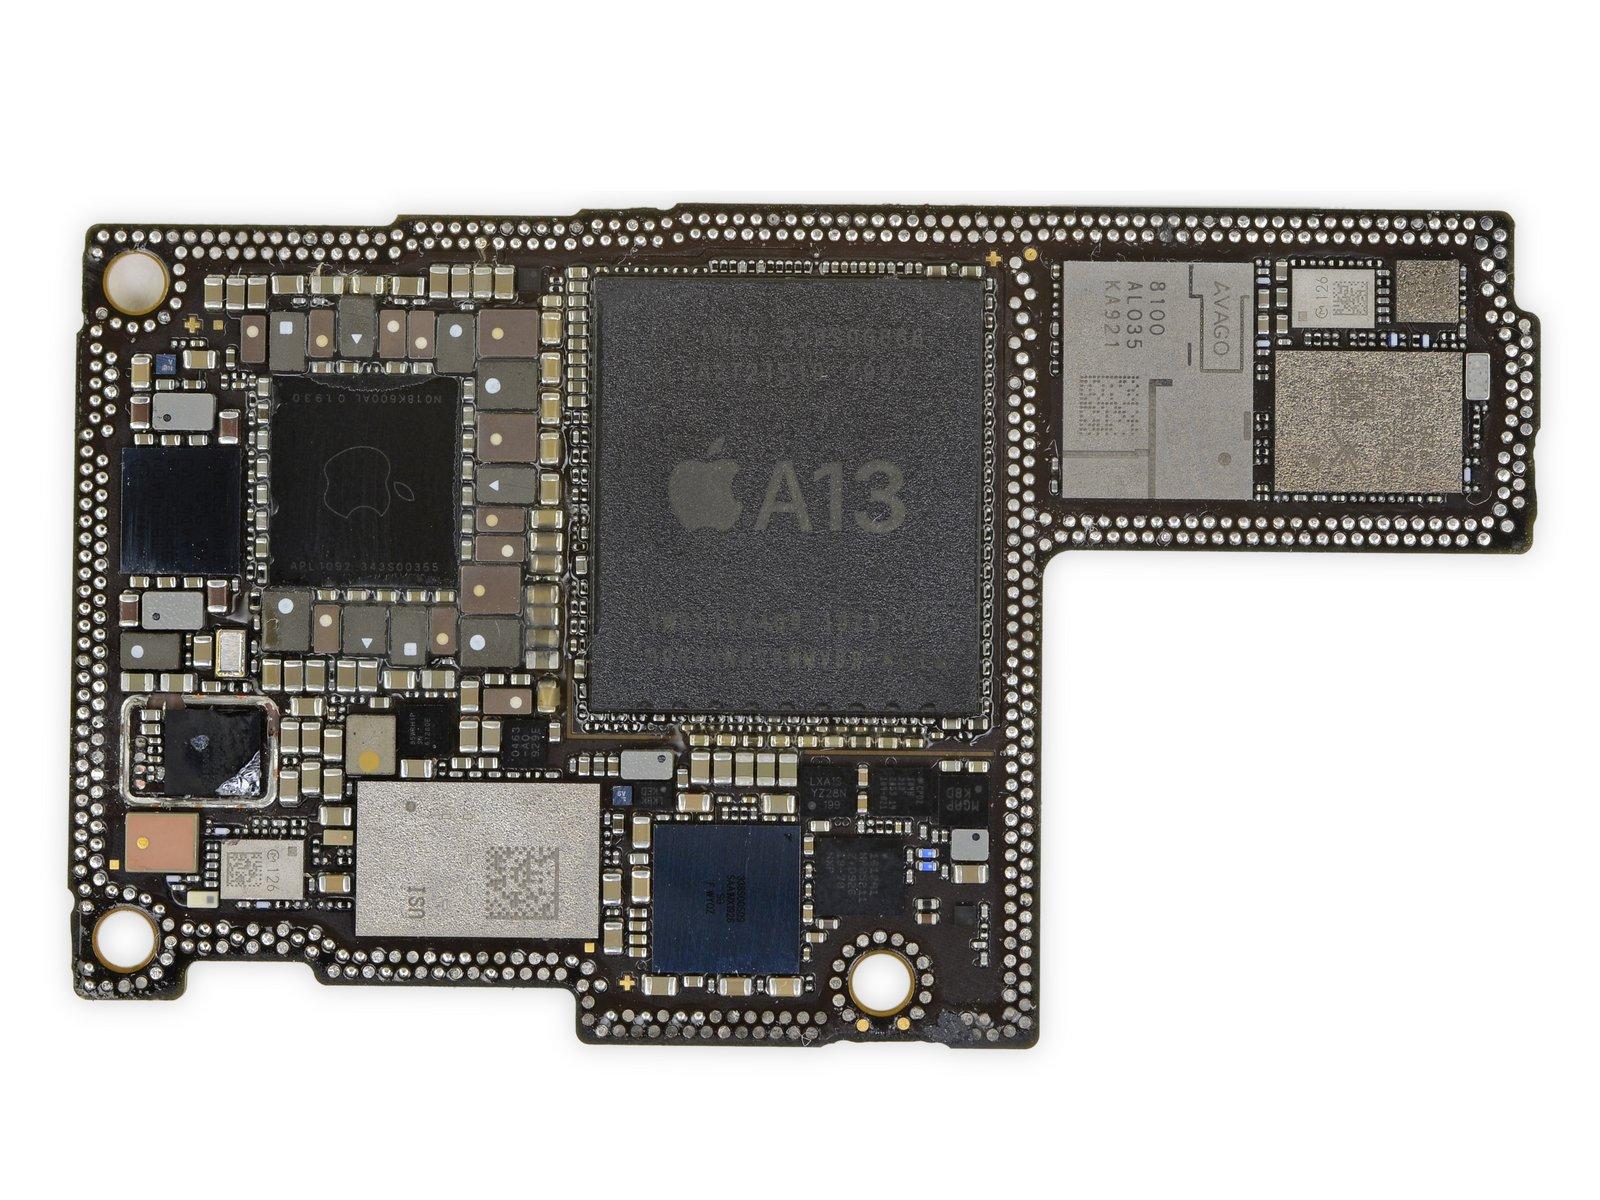 iPhone 11 Pro Max 详尽拆解 双层超小主板的照片 - 26